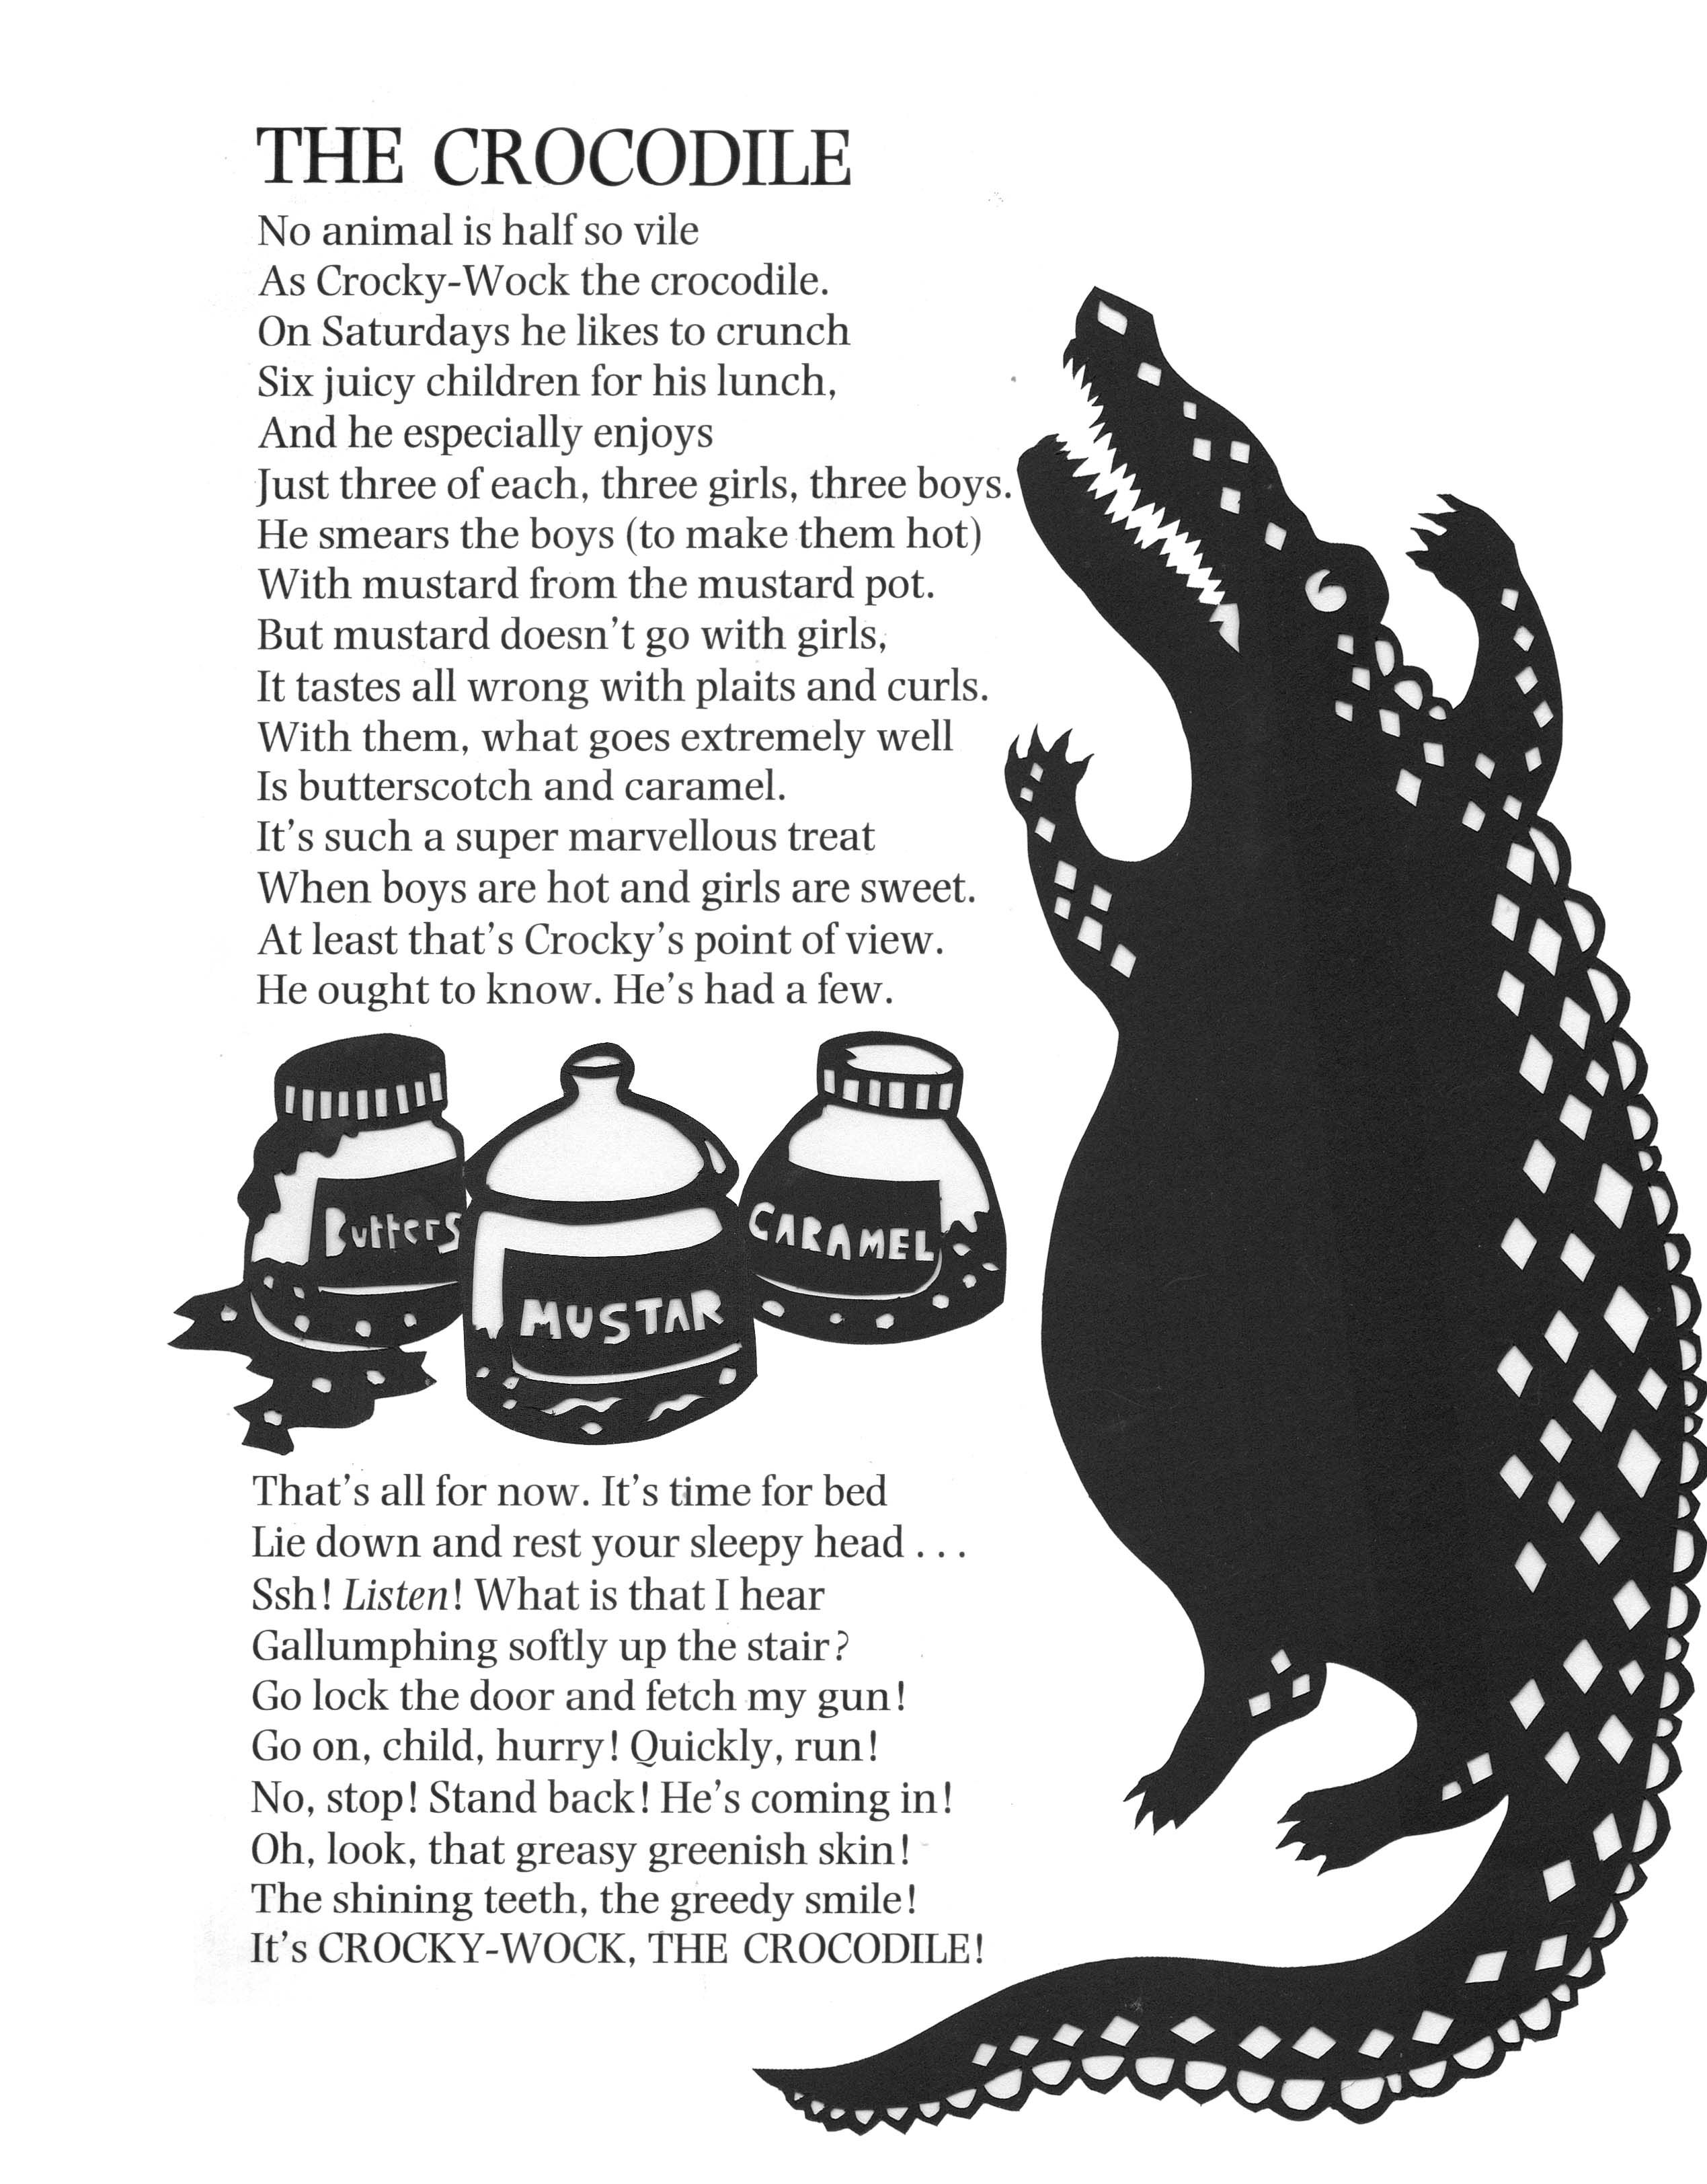 Tytka, M / Poetry by Roald Dahl